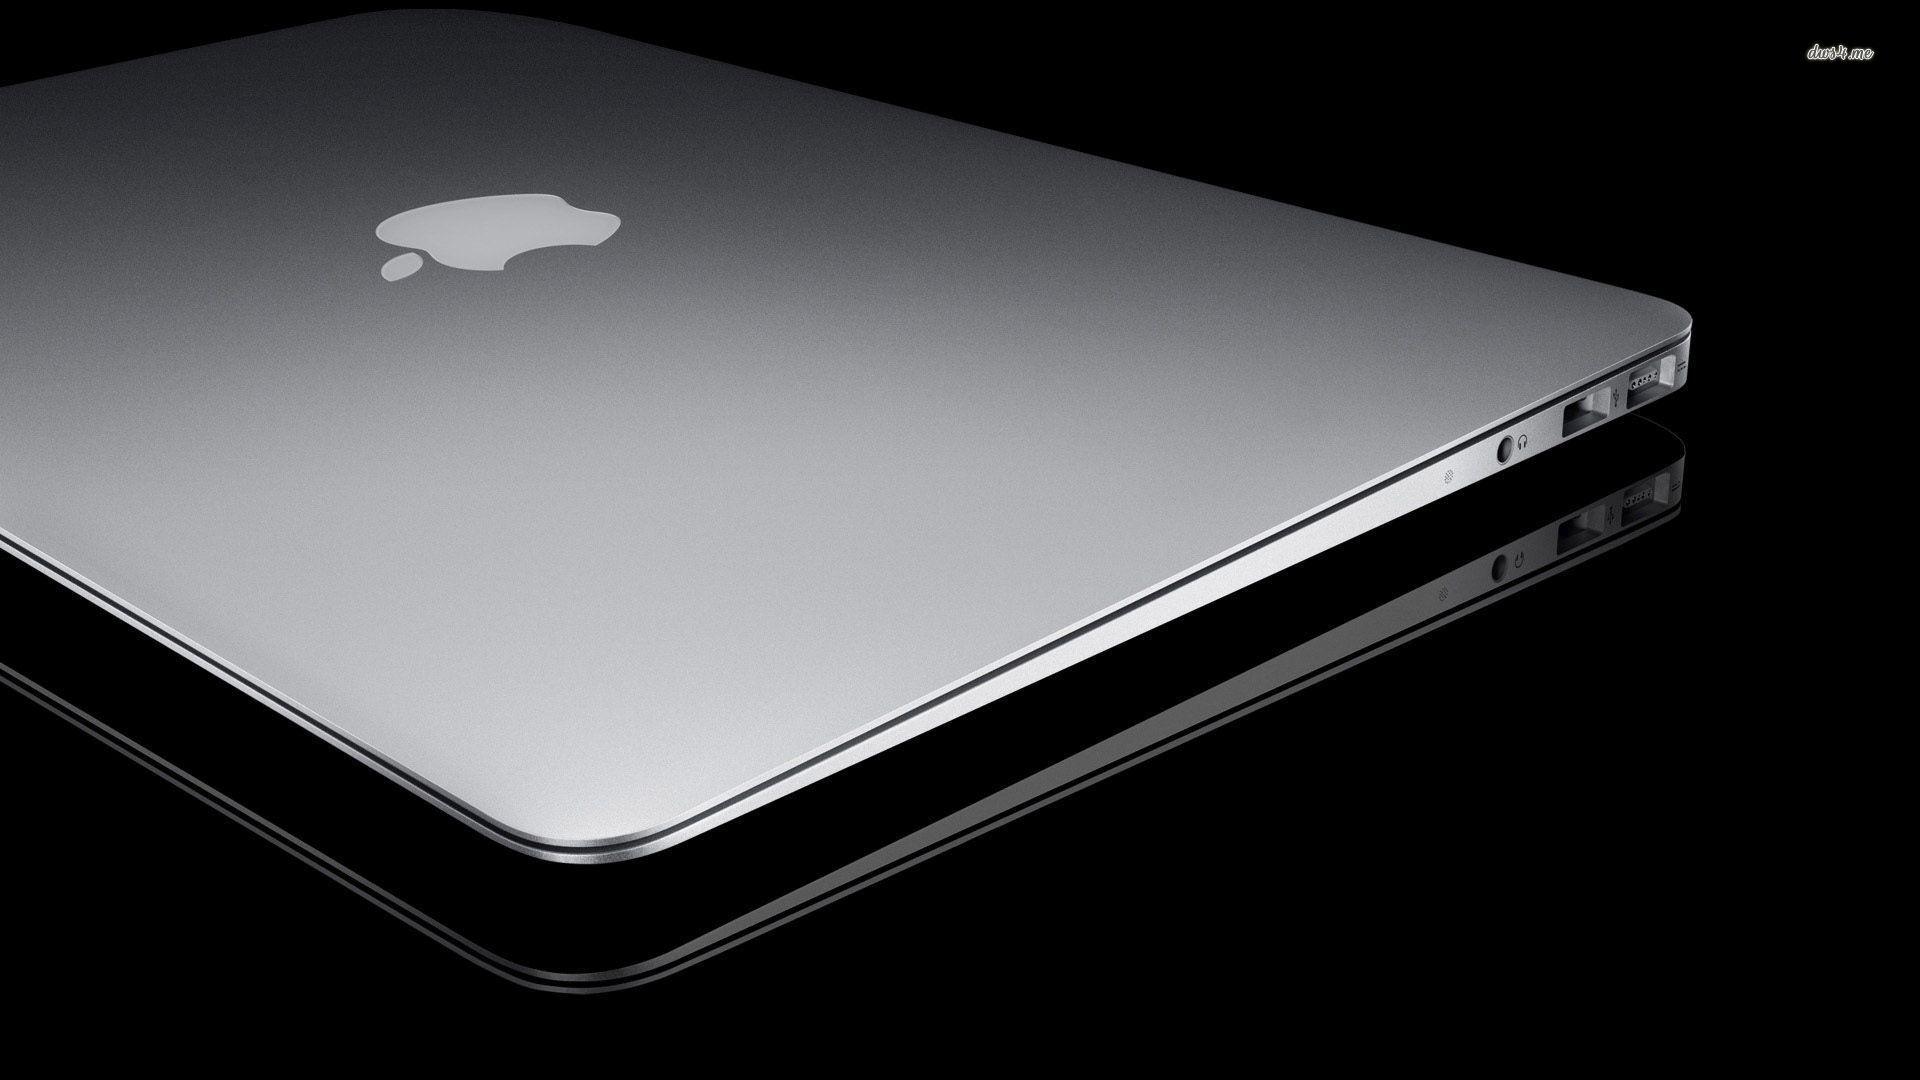 13 wallpaper 1280x800 MacBook Air 13 wallpaper 1366x768 MacBook Air 13 1920x1080